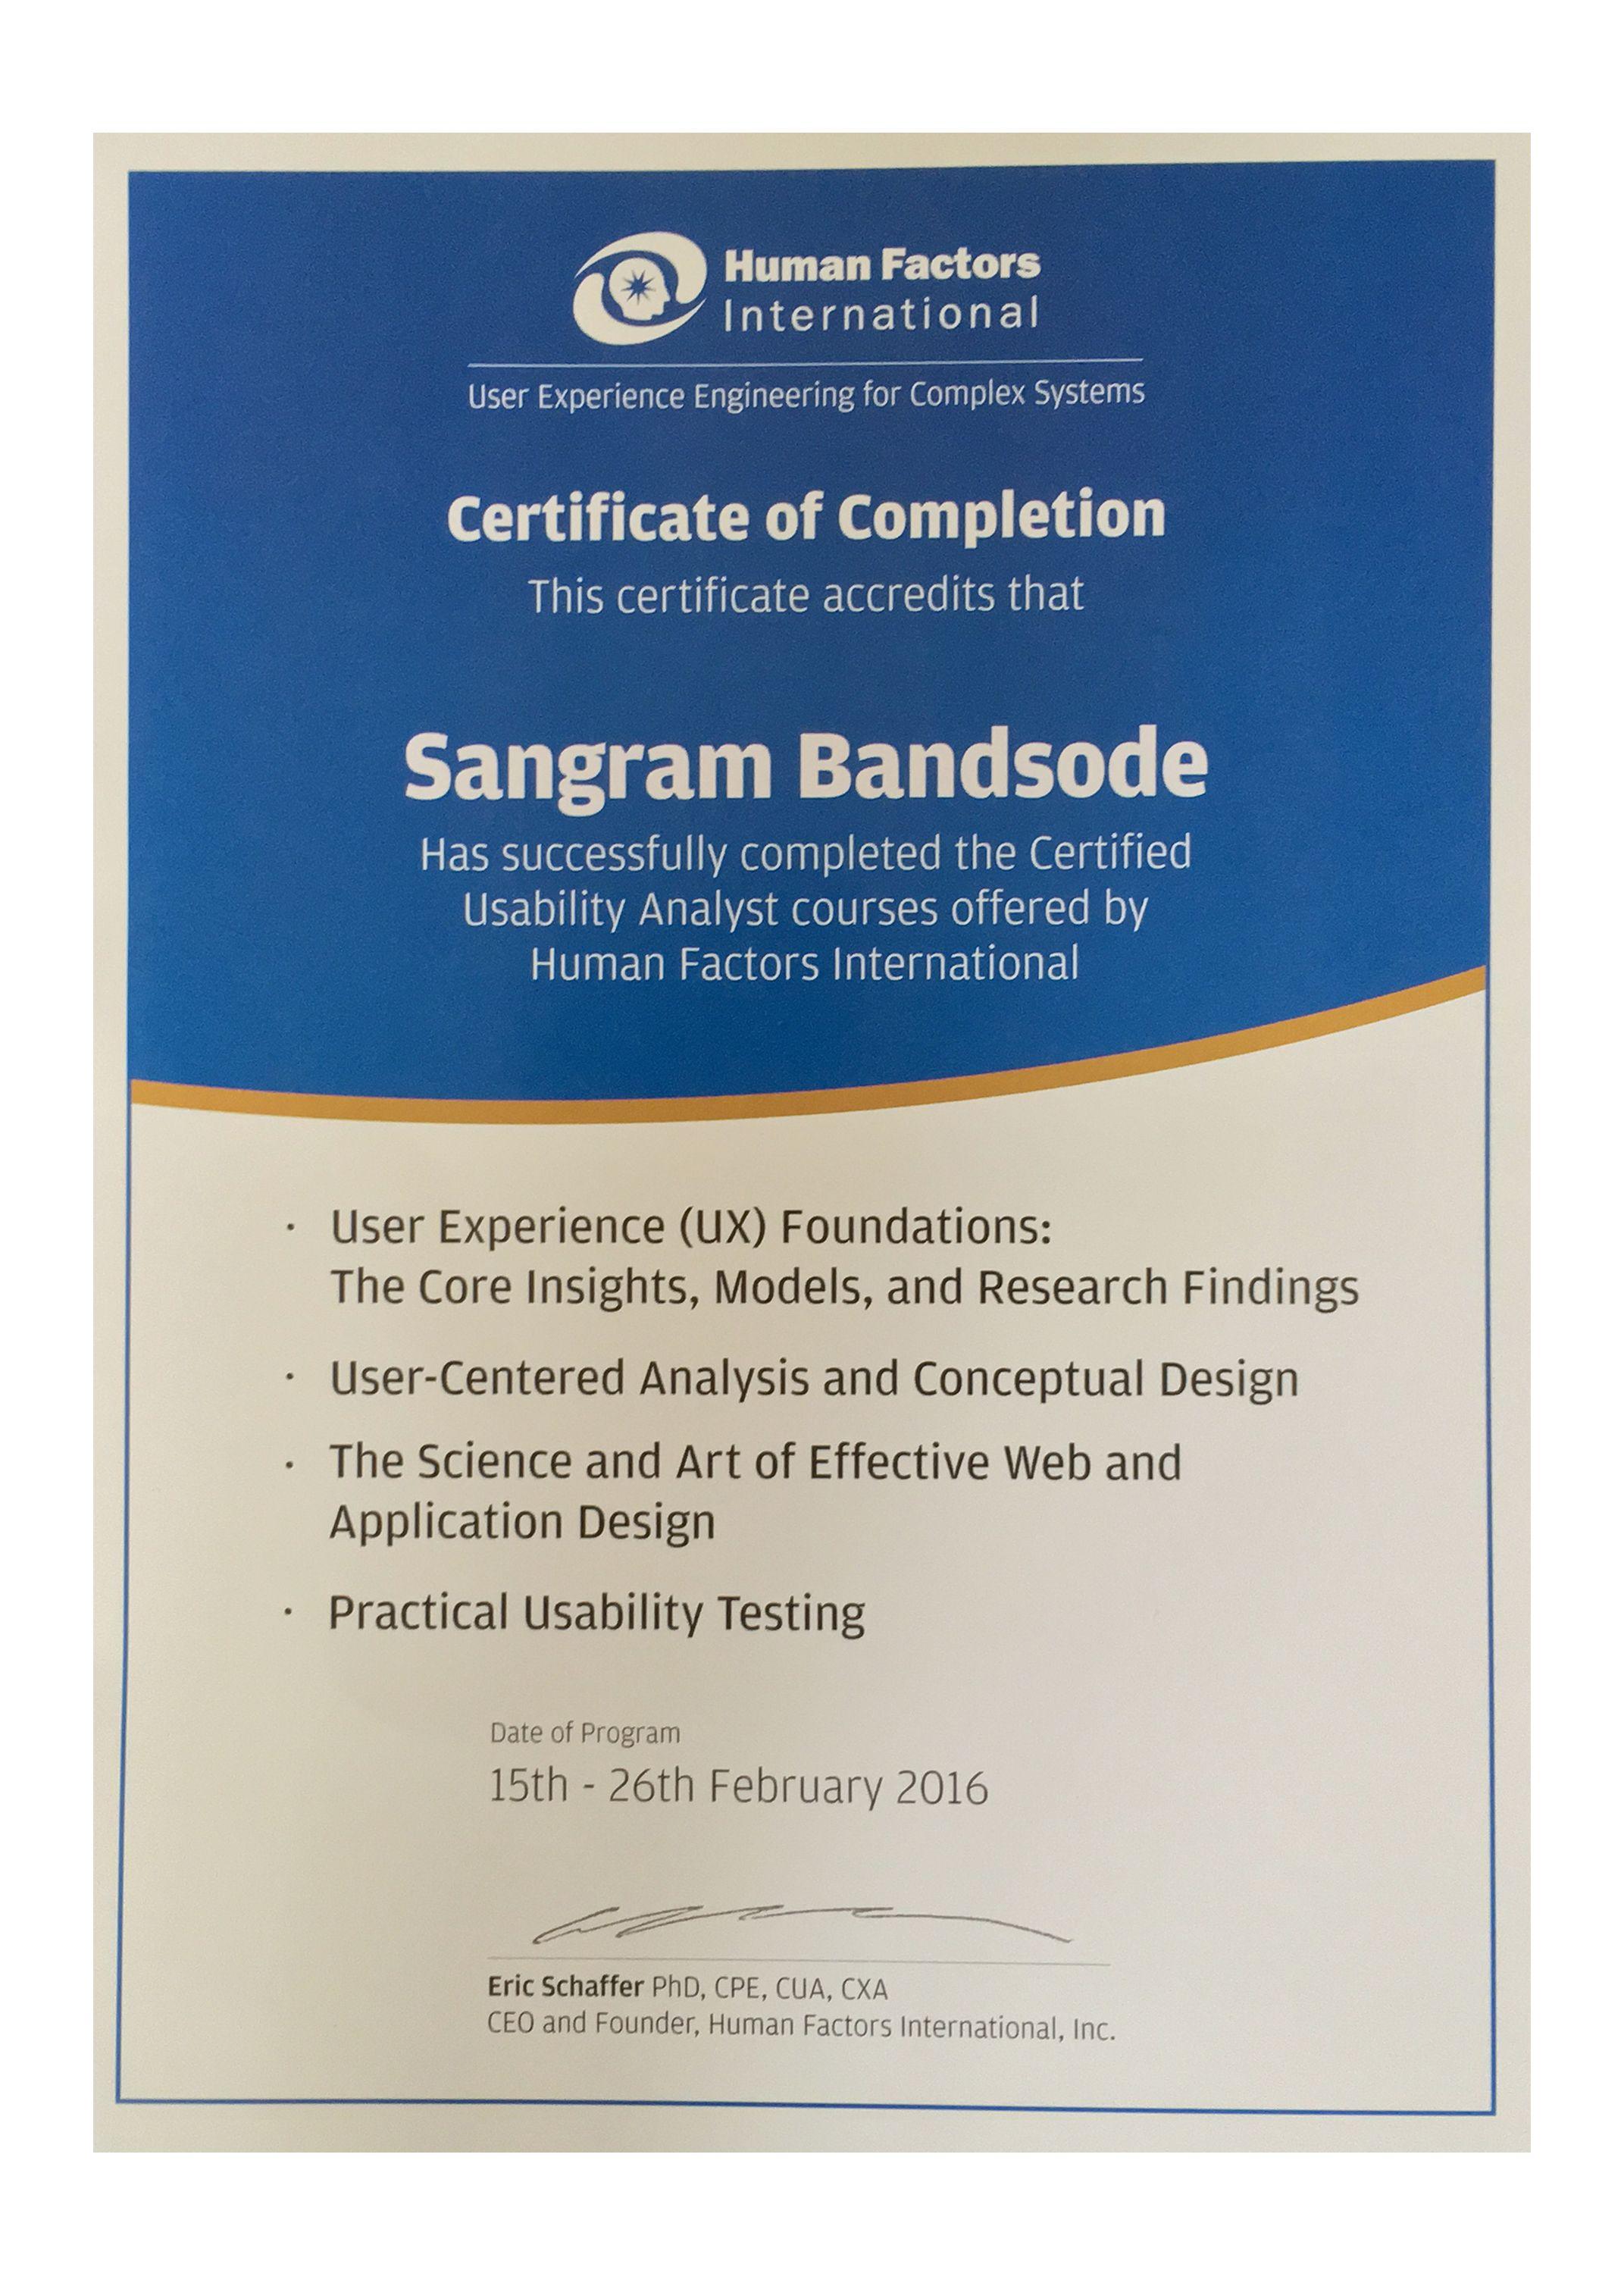 Rocc Certification Images Creative Certificate Design Inspiration